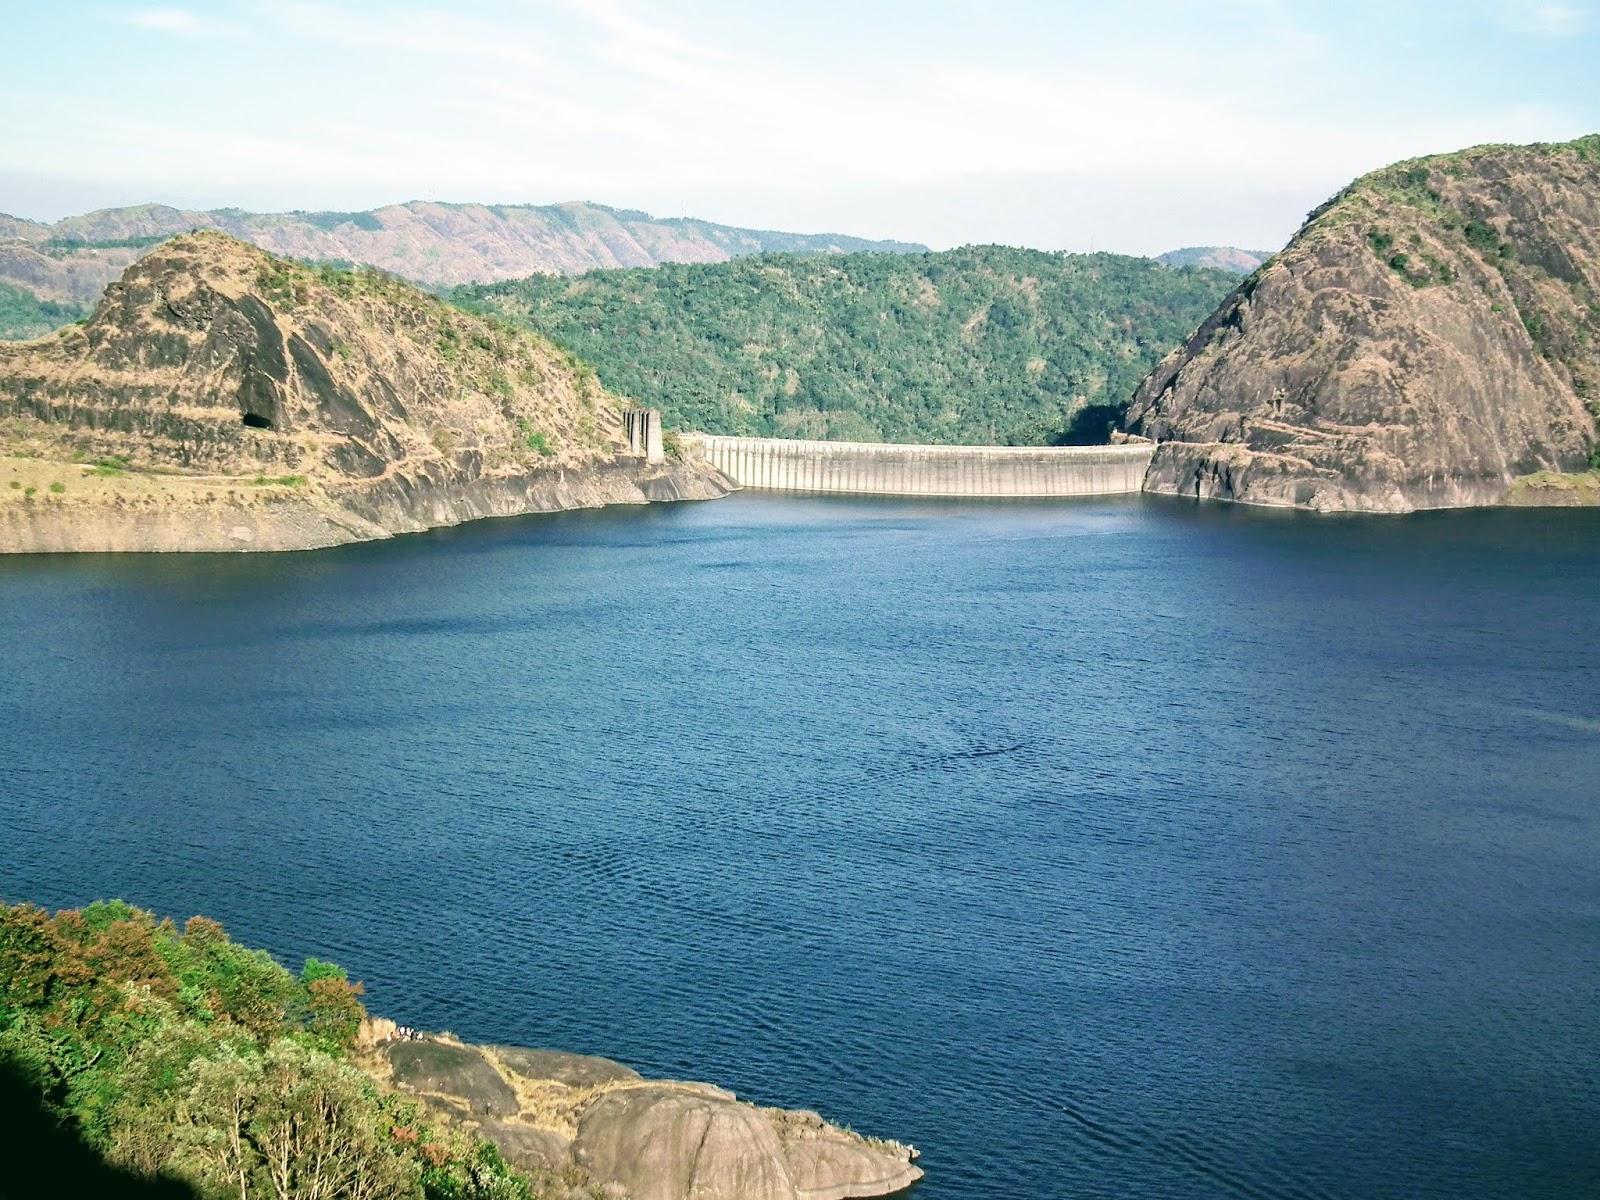 Arch dam, Idduki